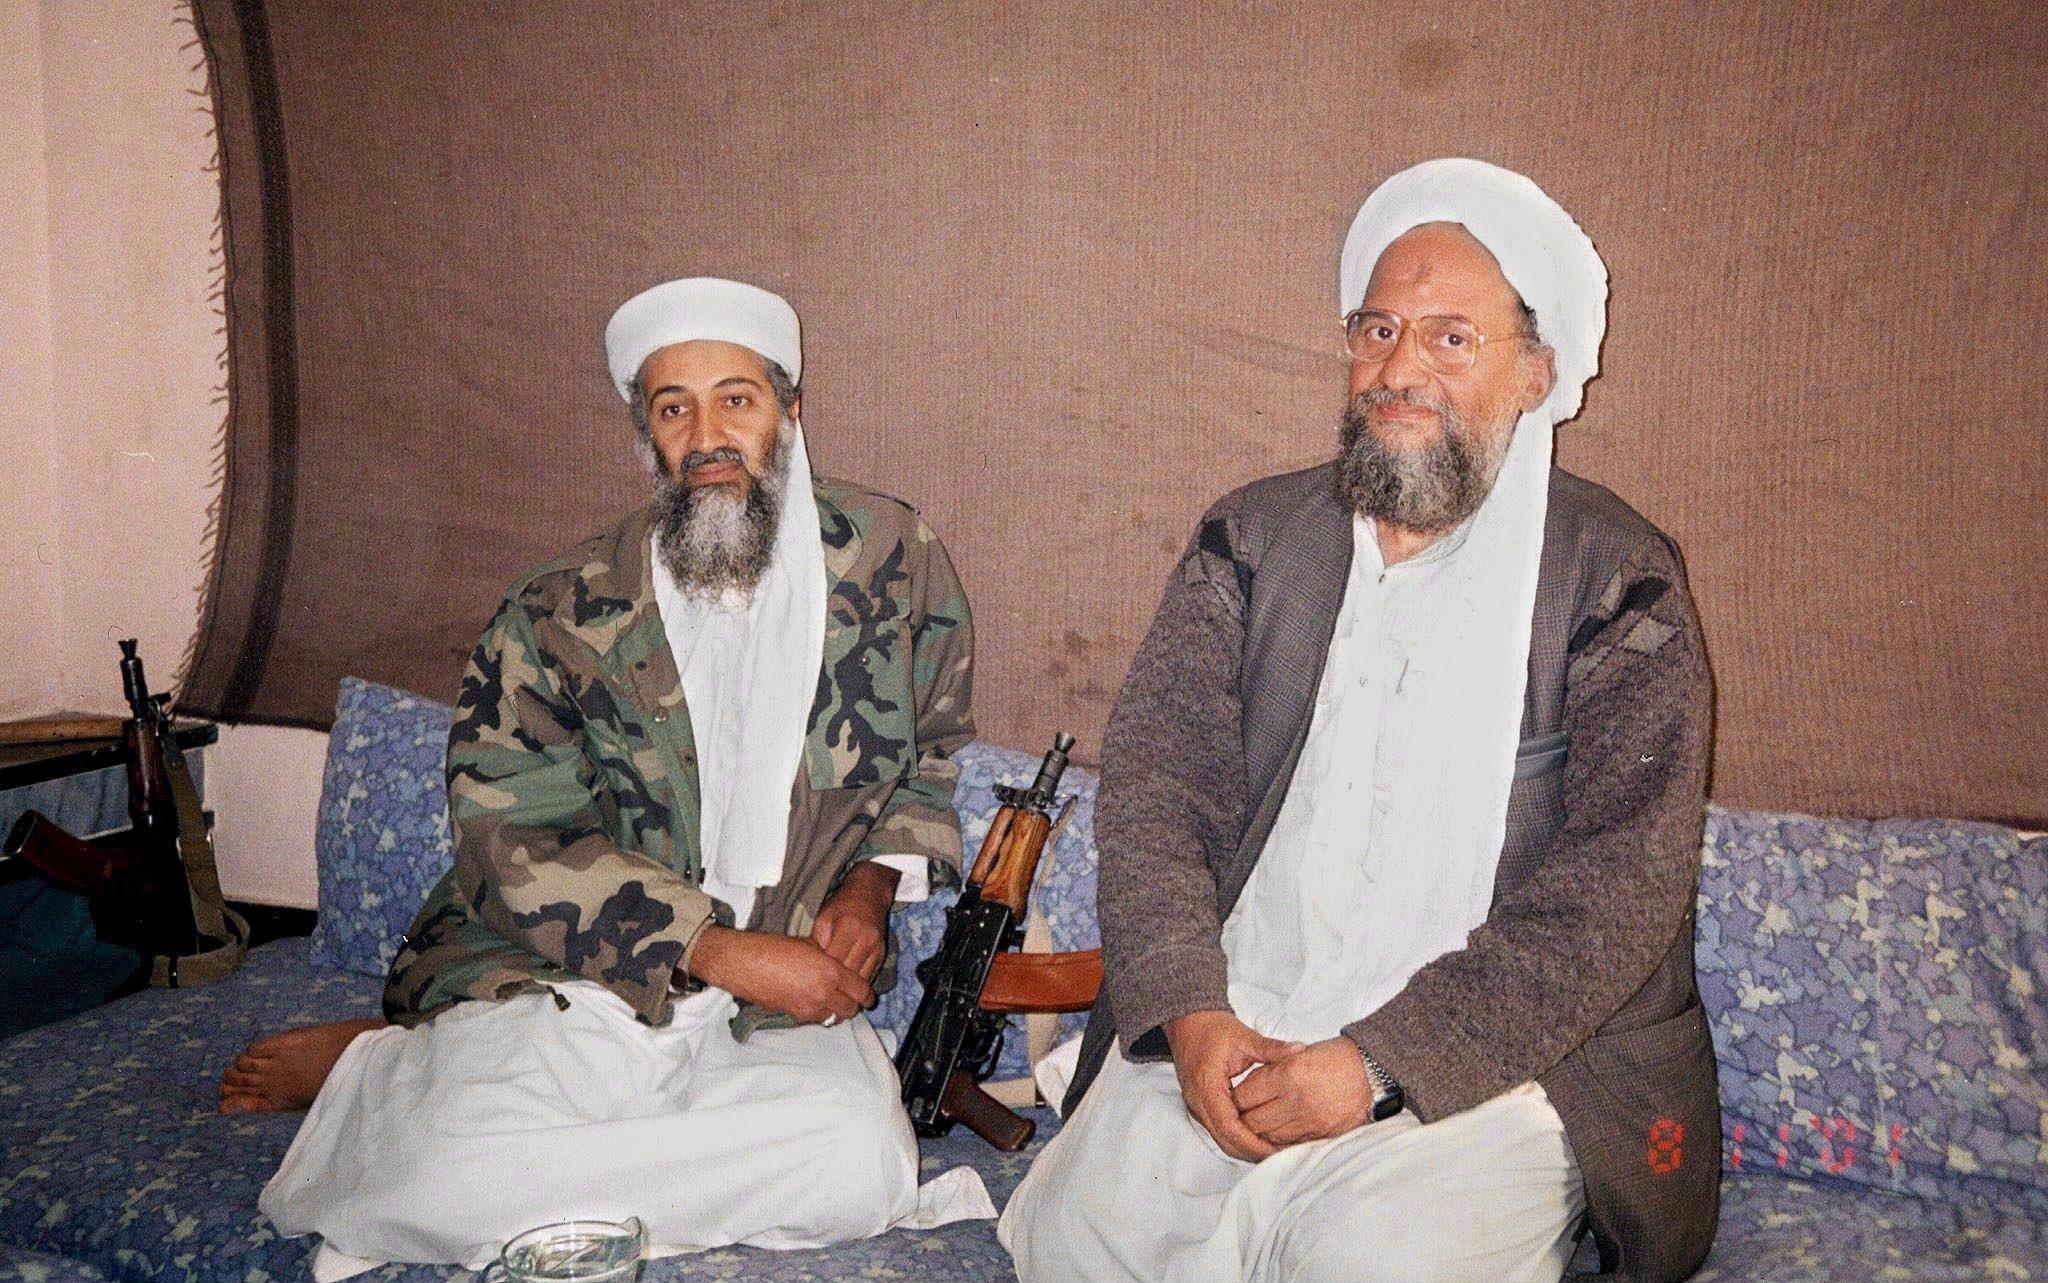 Al Qaeda is Dead, Long Live Al Qaeda